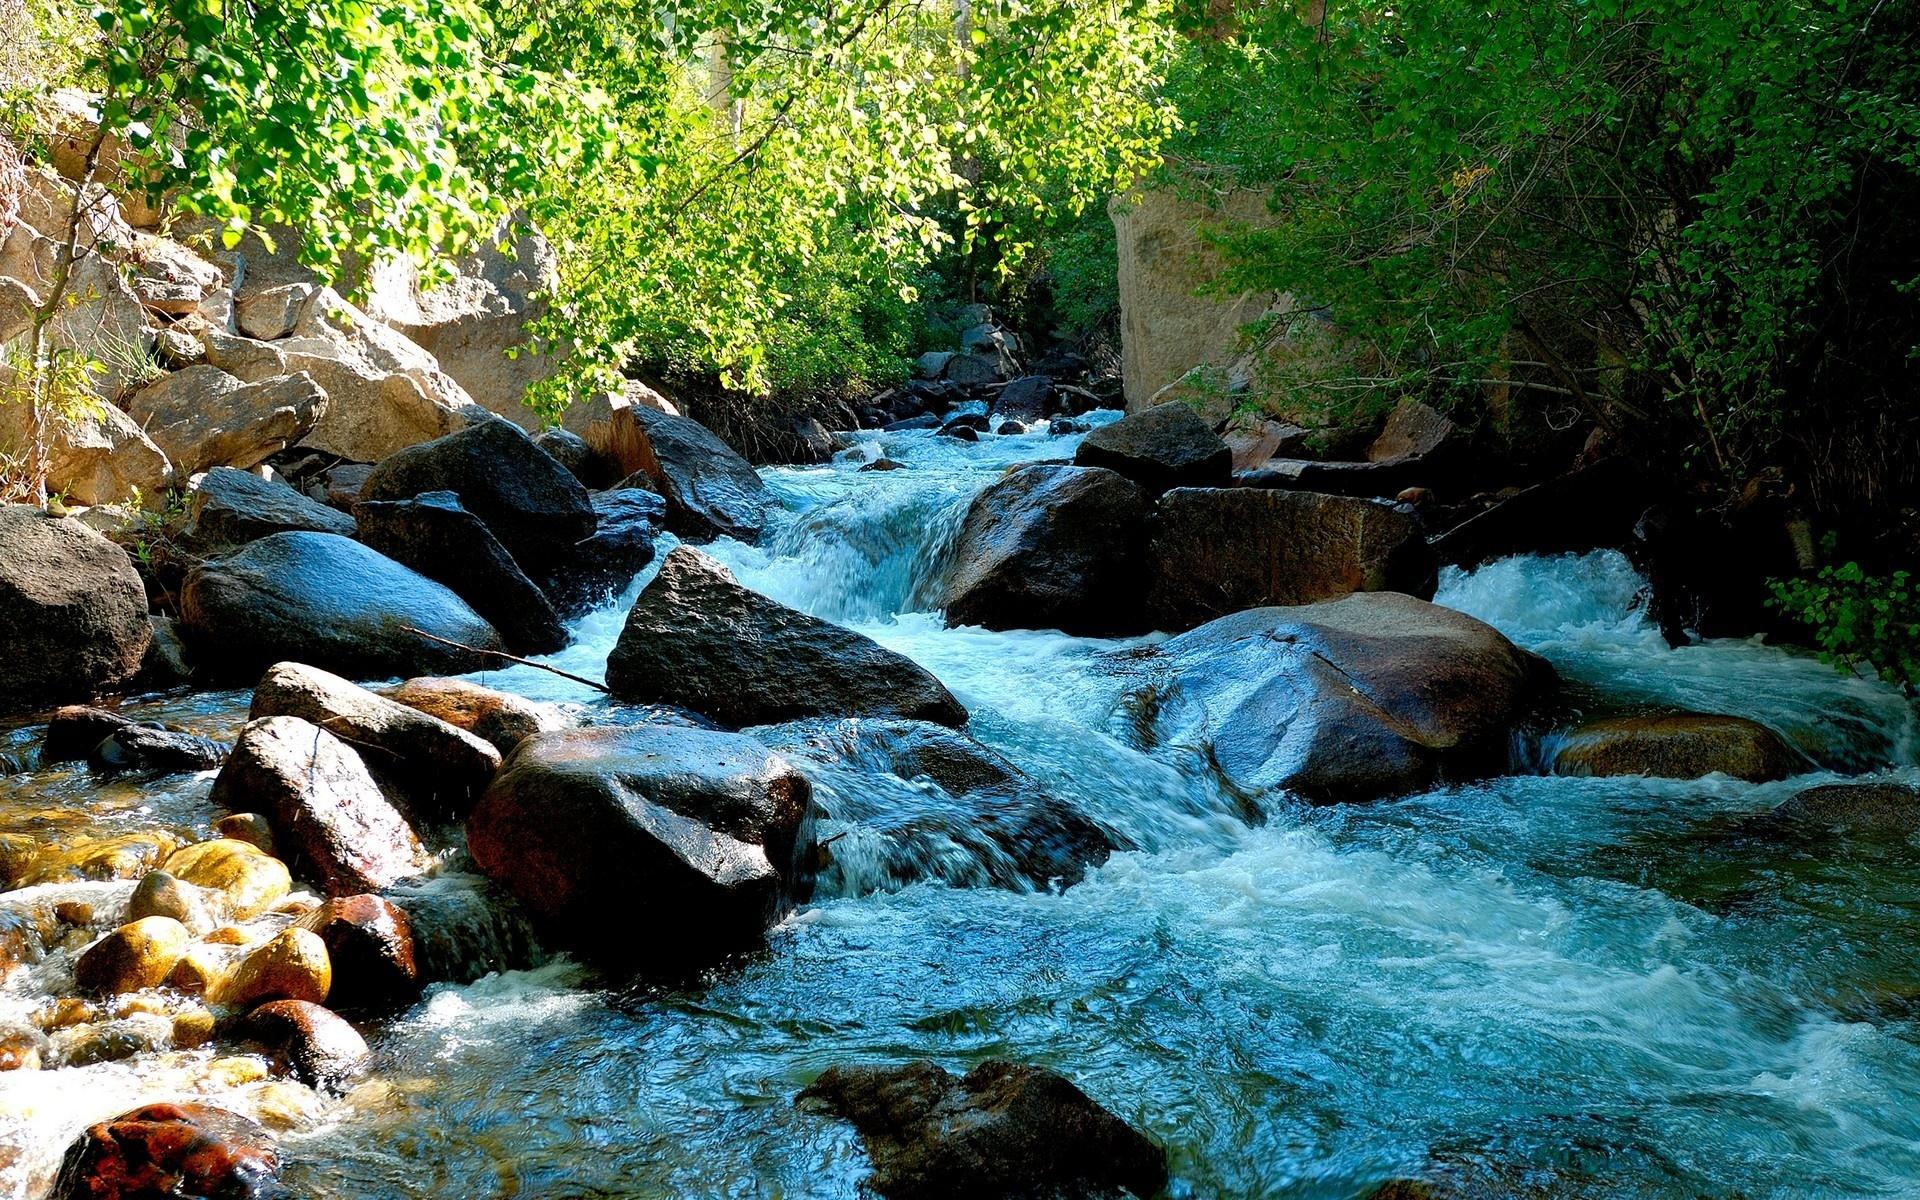 скалы, вода, камни